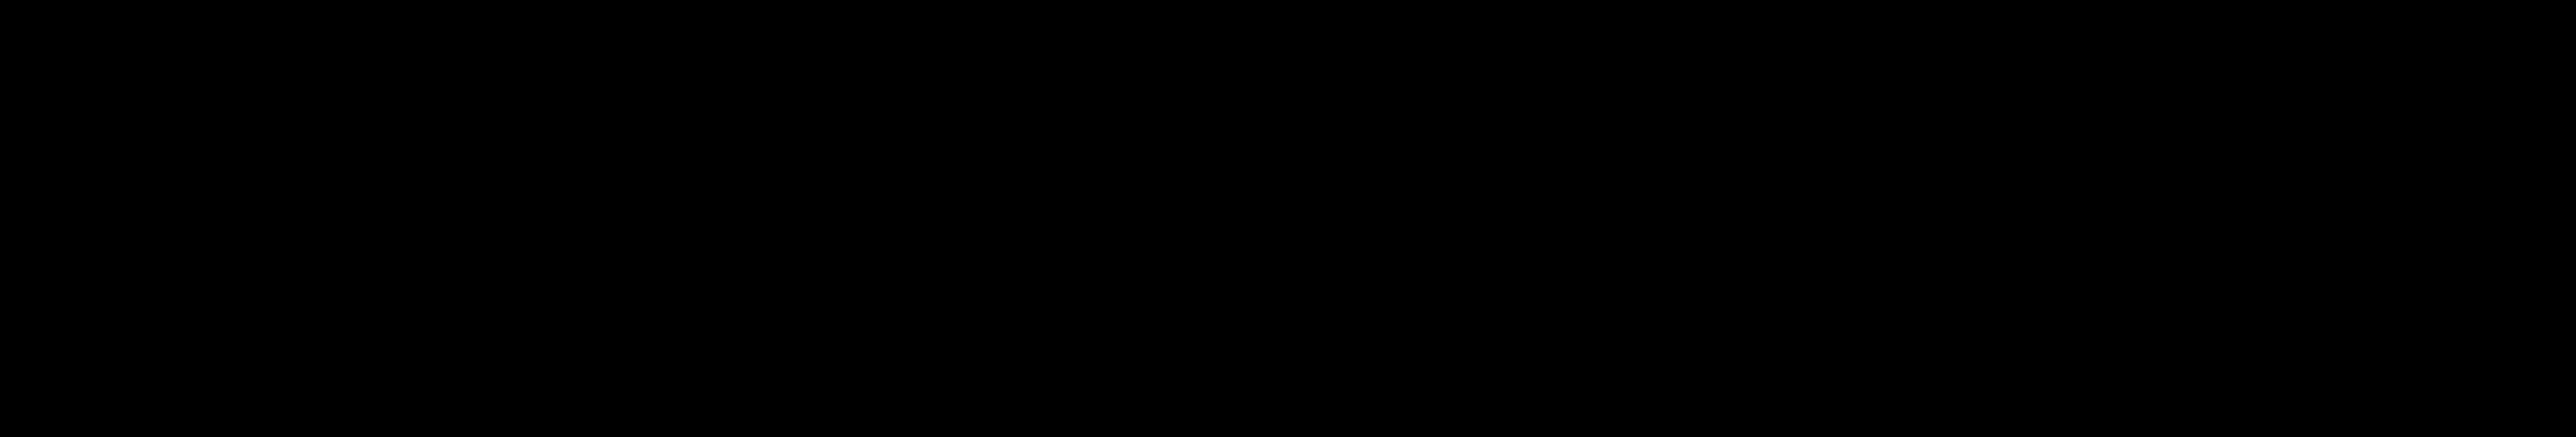 Engine Prime logo black